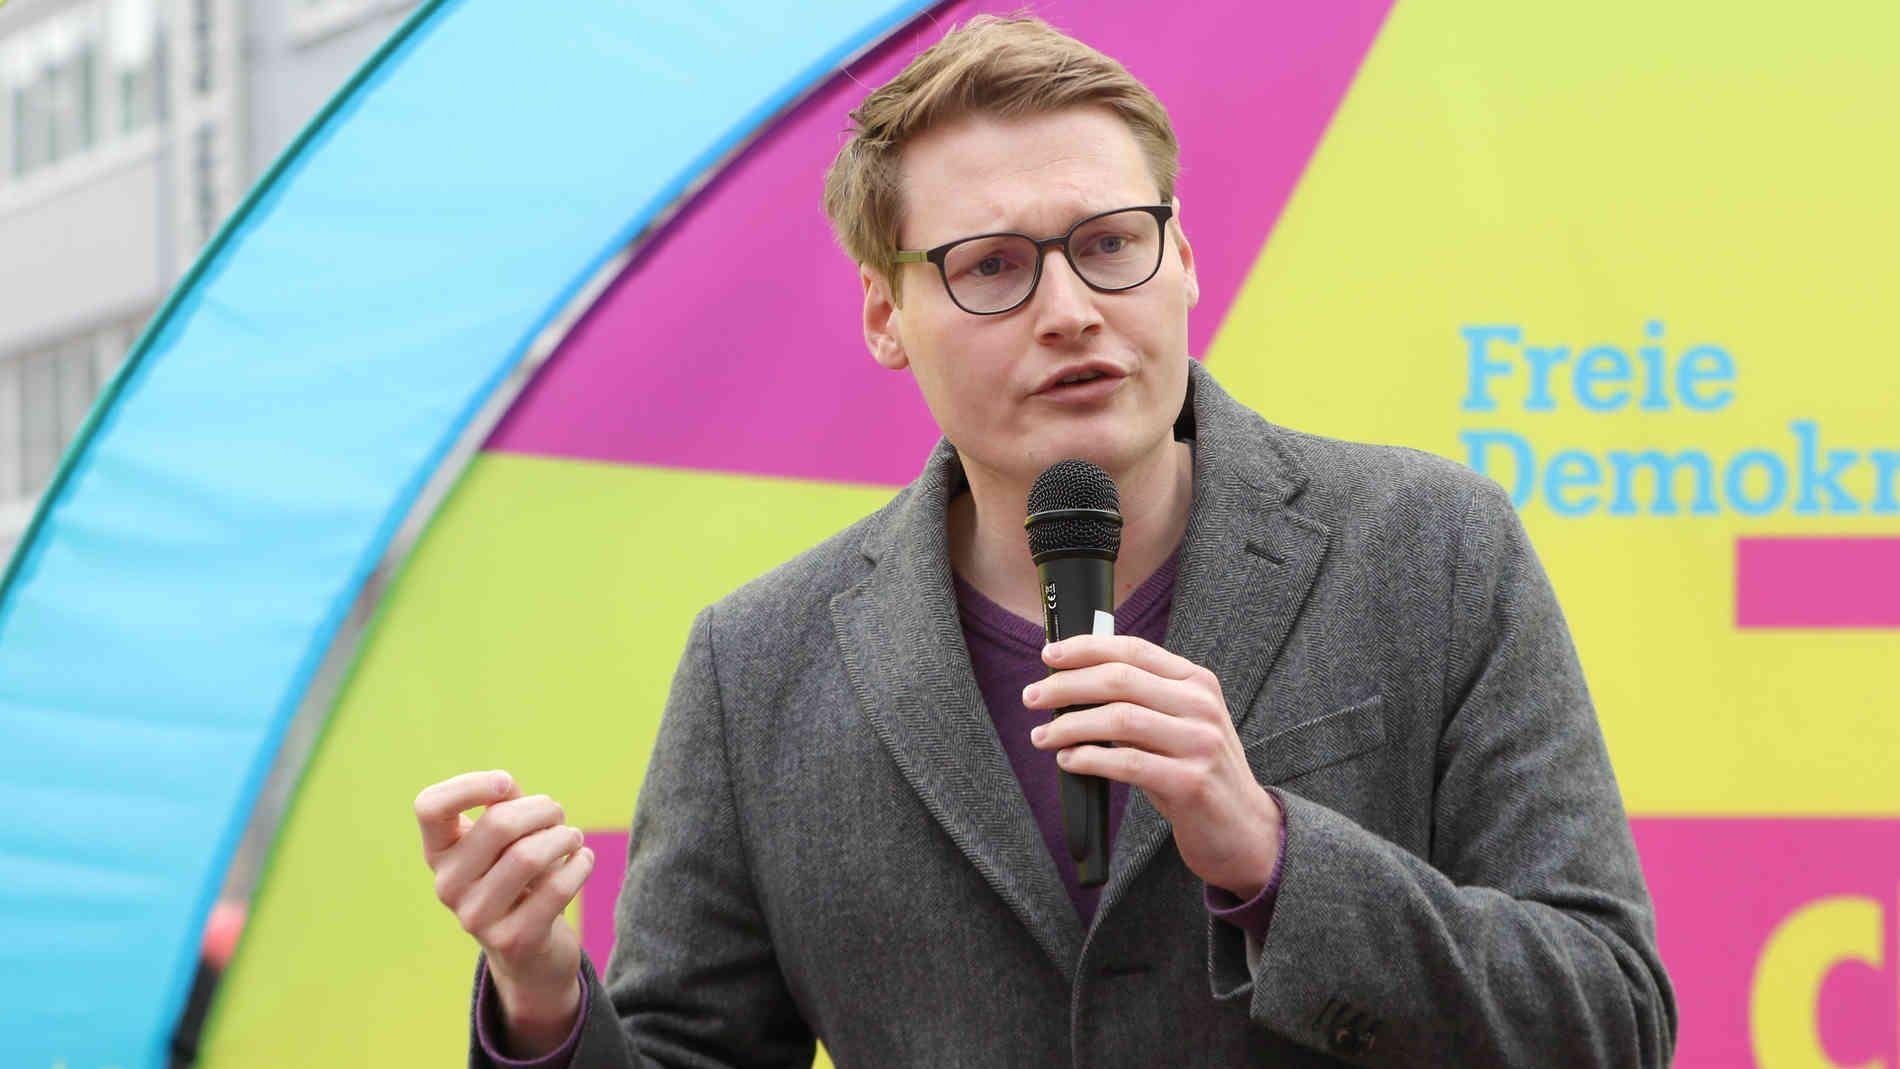 Europawahl: Liberale machen Wahlkampf in Aachen